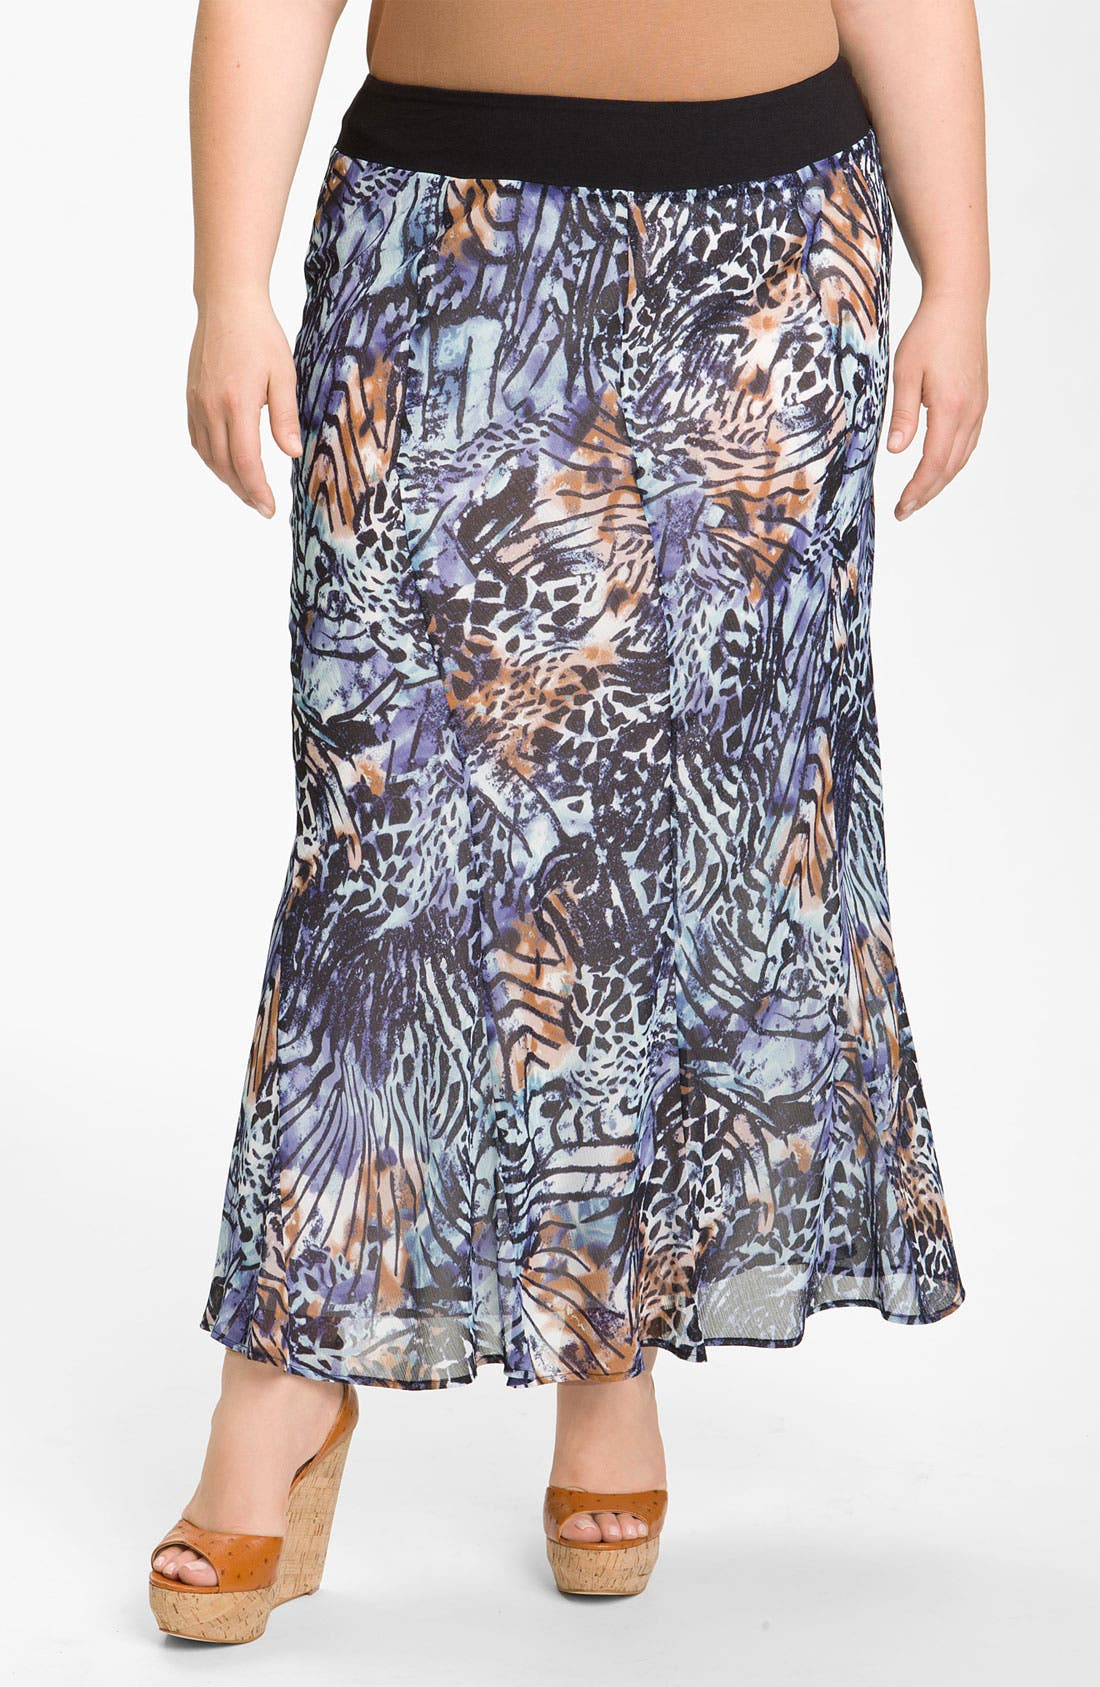 Alternate Image 1 Selected - Nic + Zoe 'Pattern Play' Long Skirt (Plus)